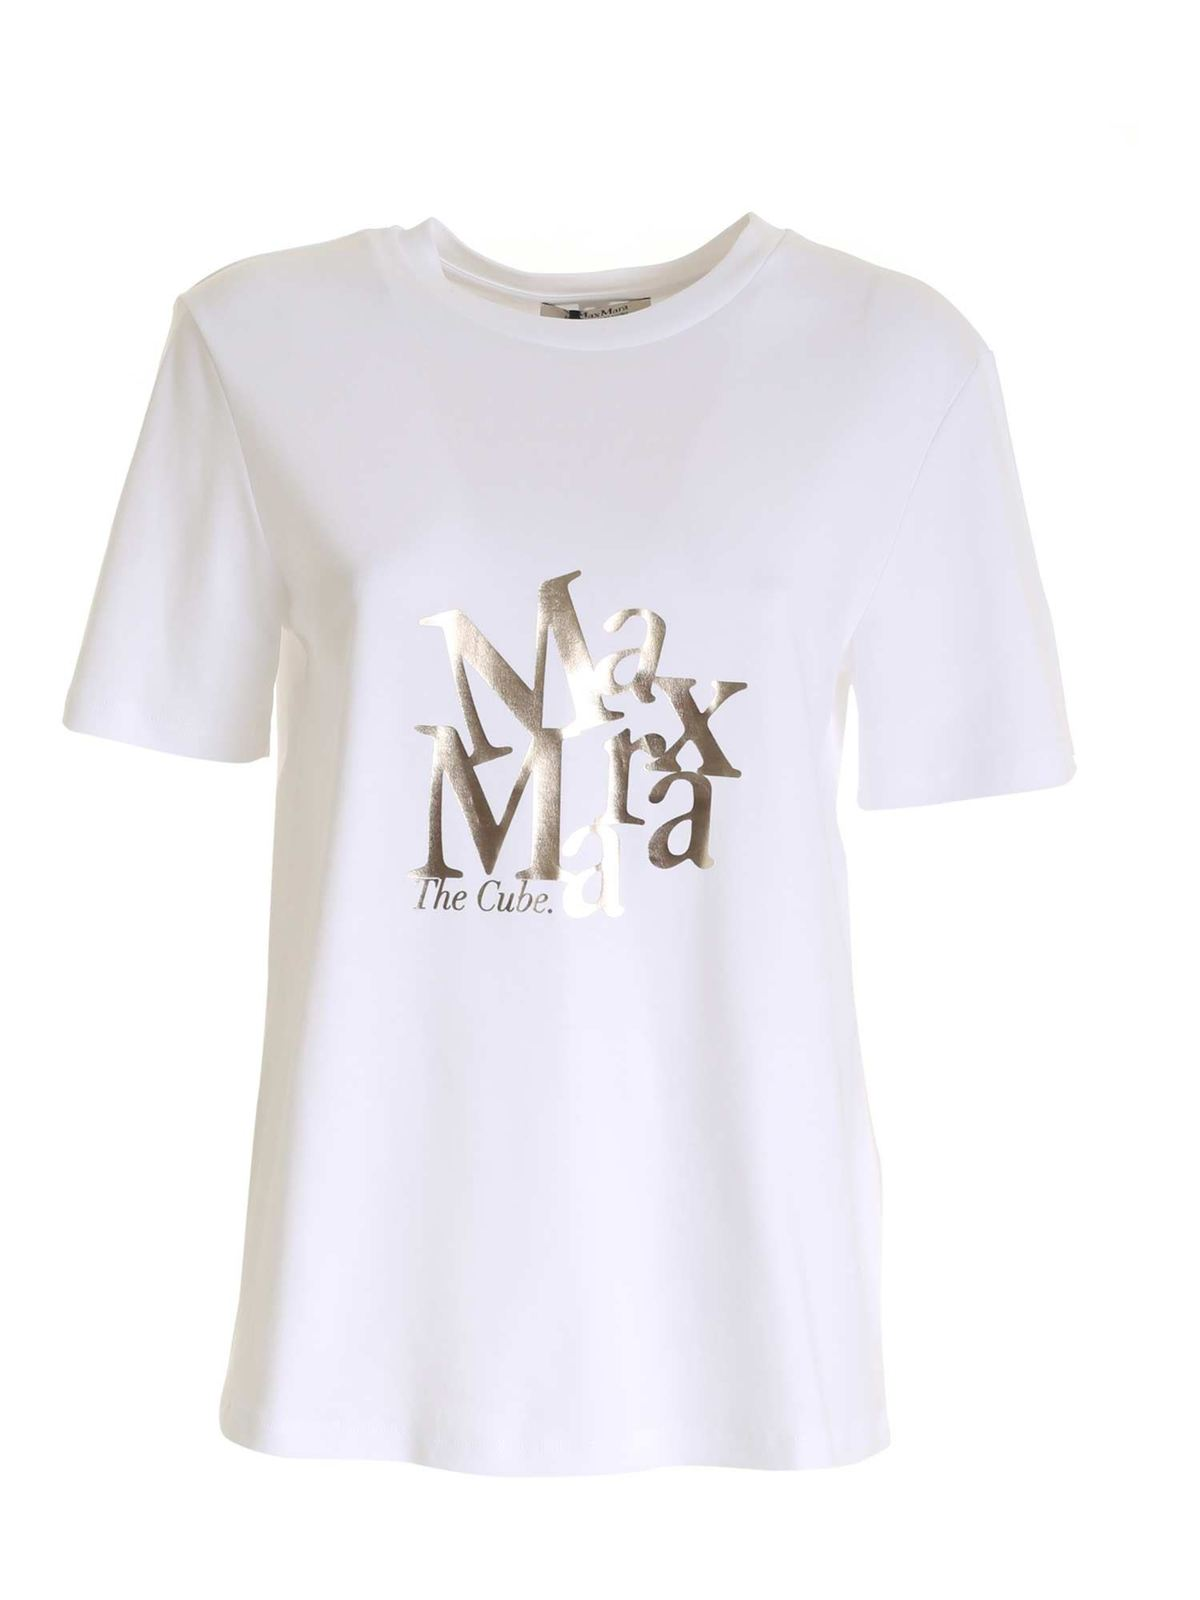 Max Mara SALETTA T-SHIRT IN WHITE